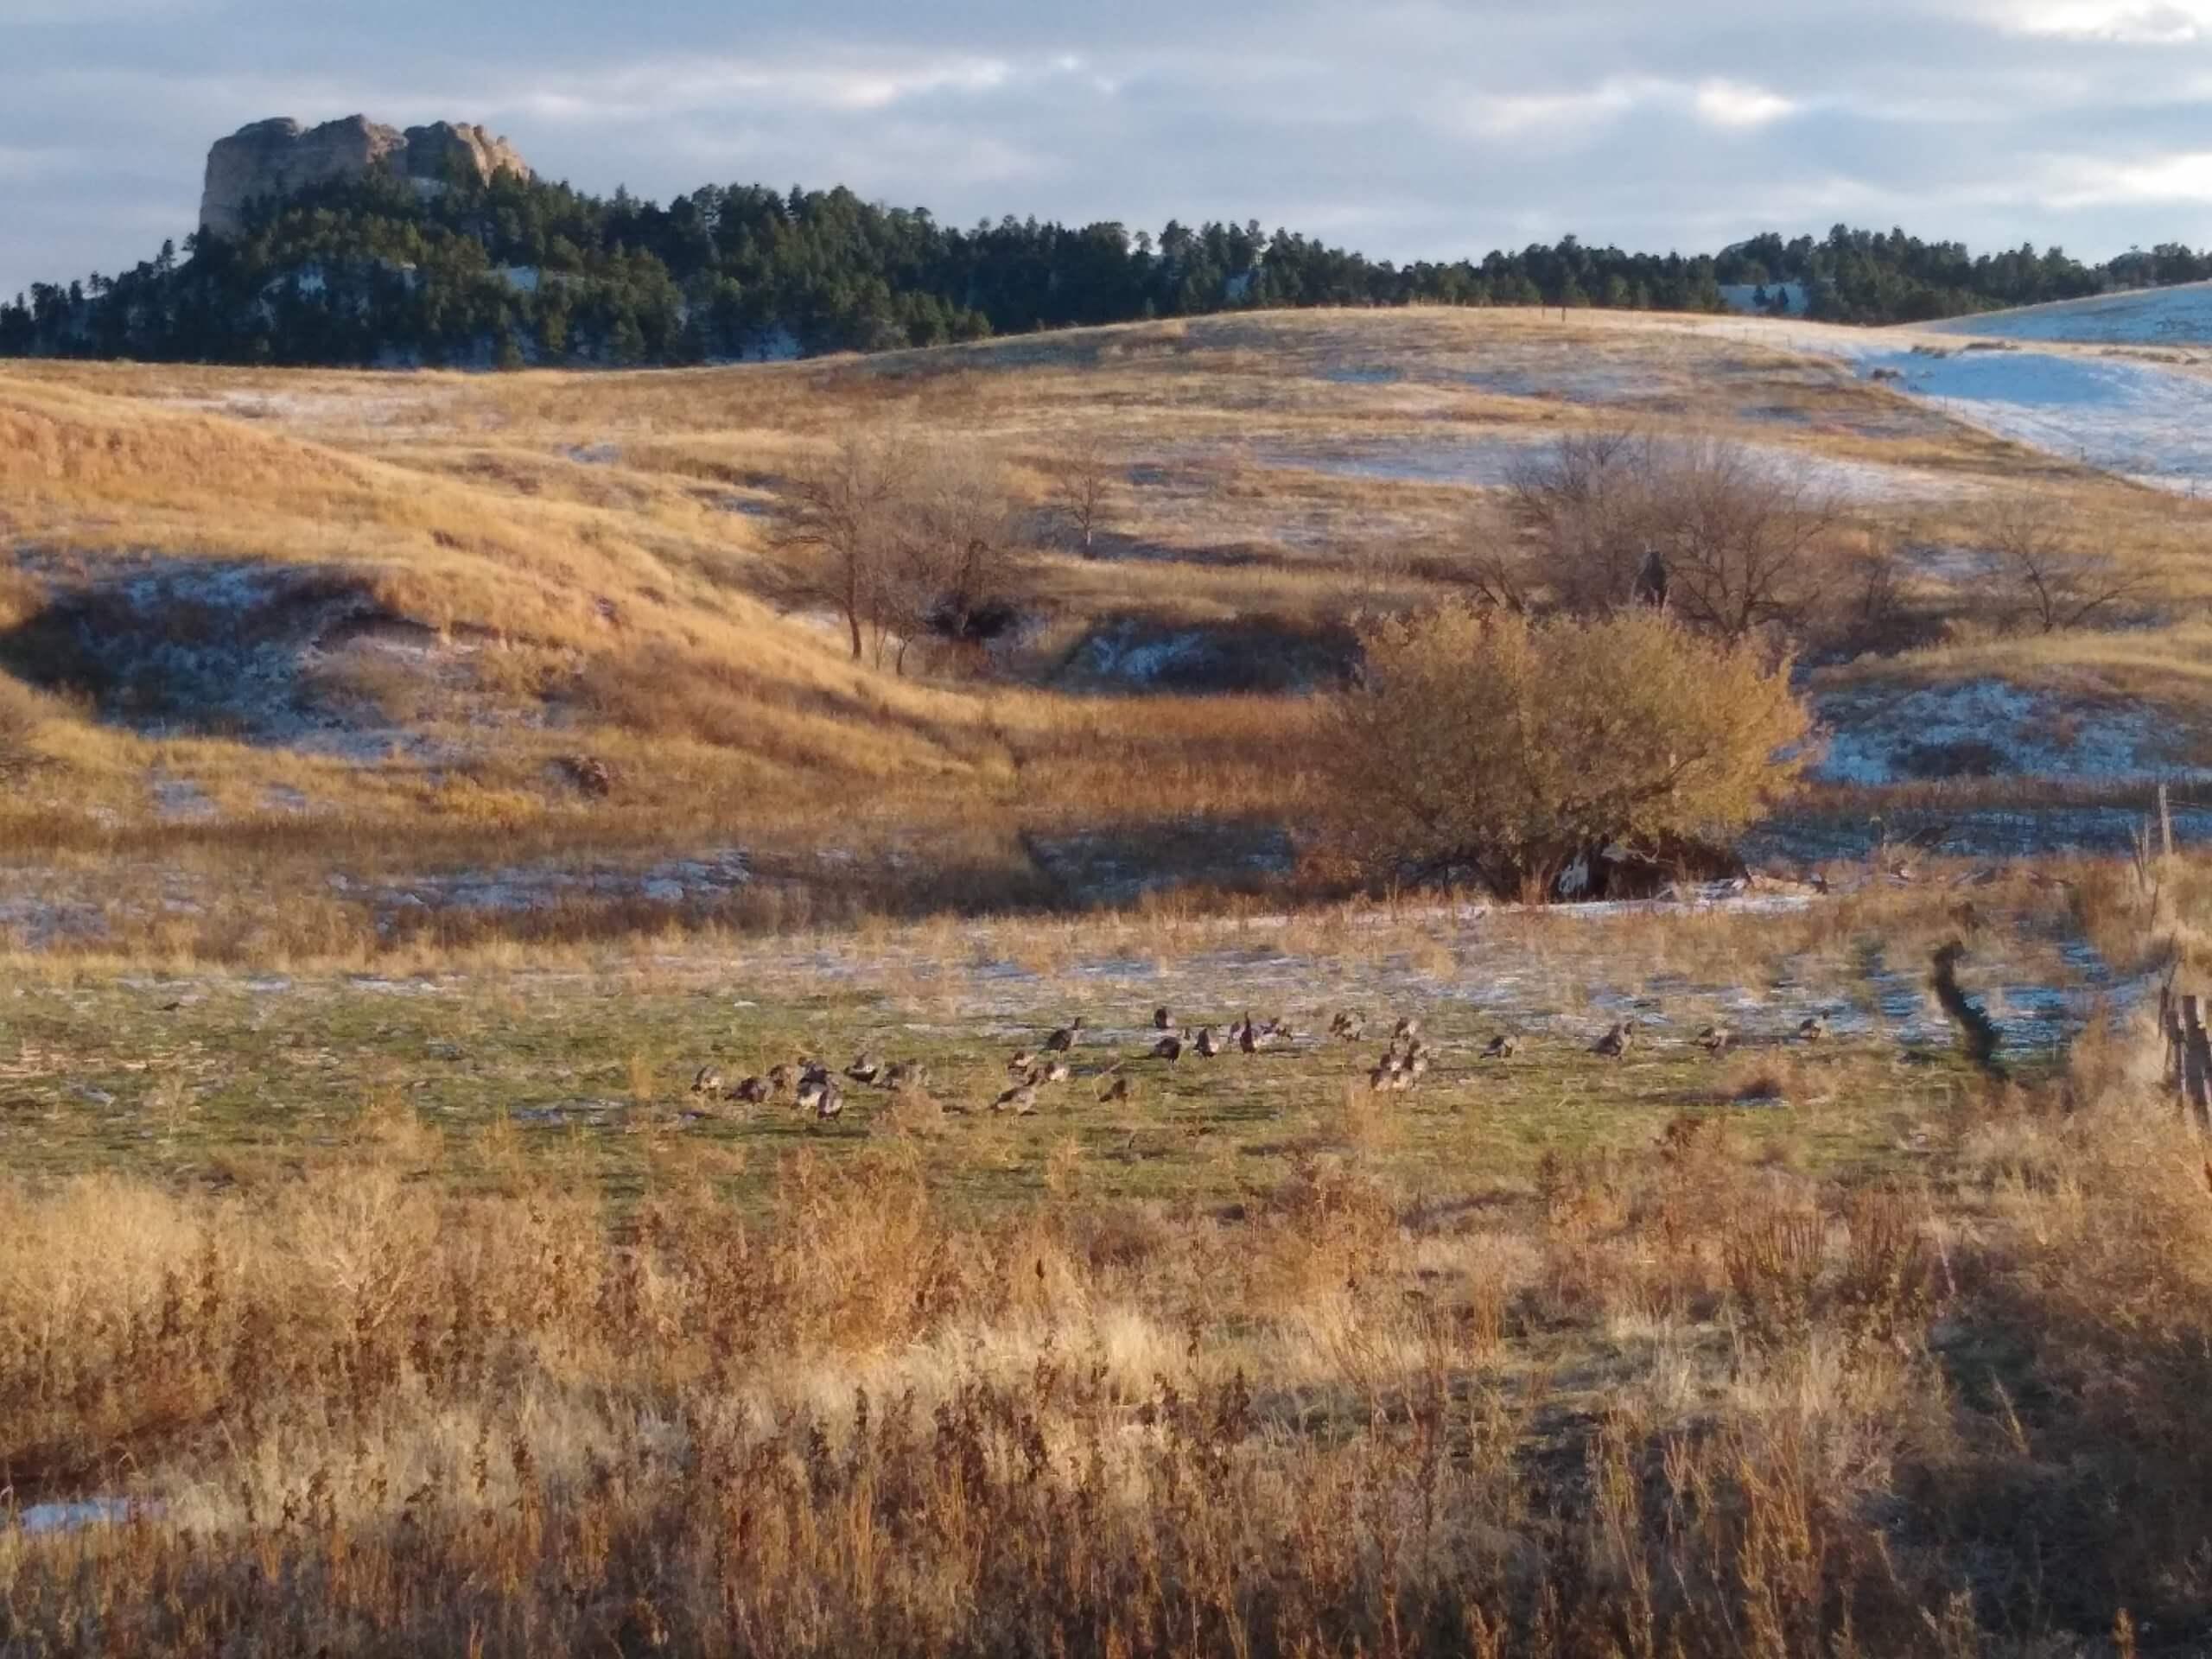 wild turkey foraging on the ranch